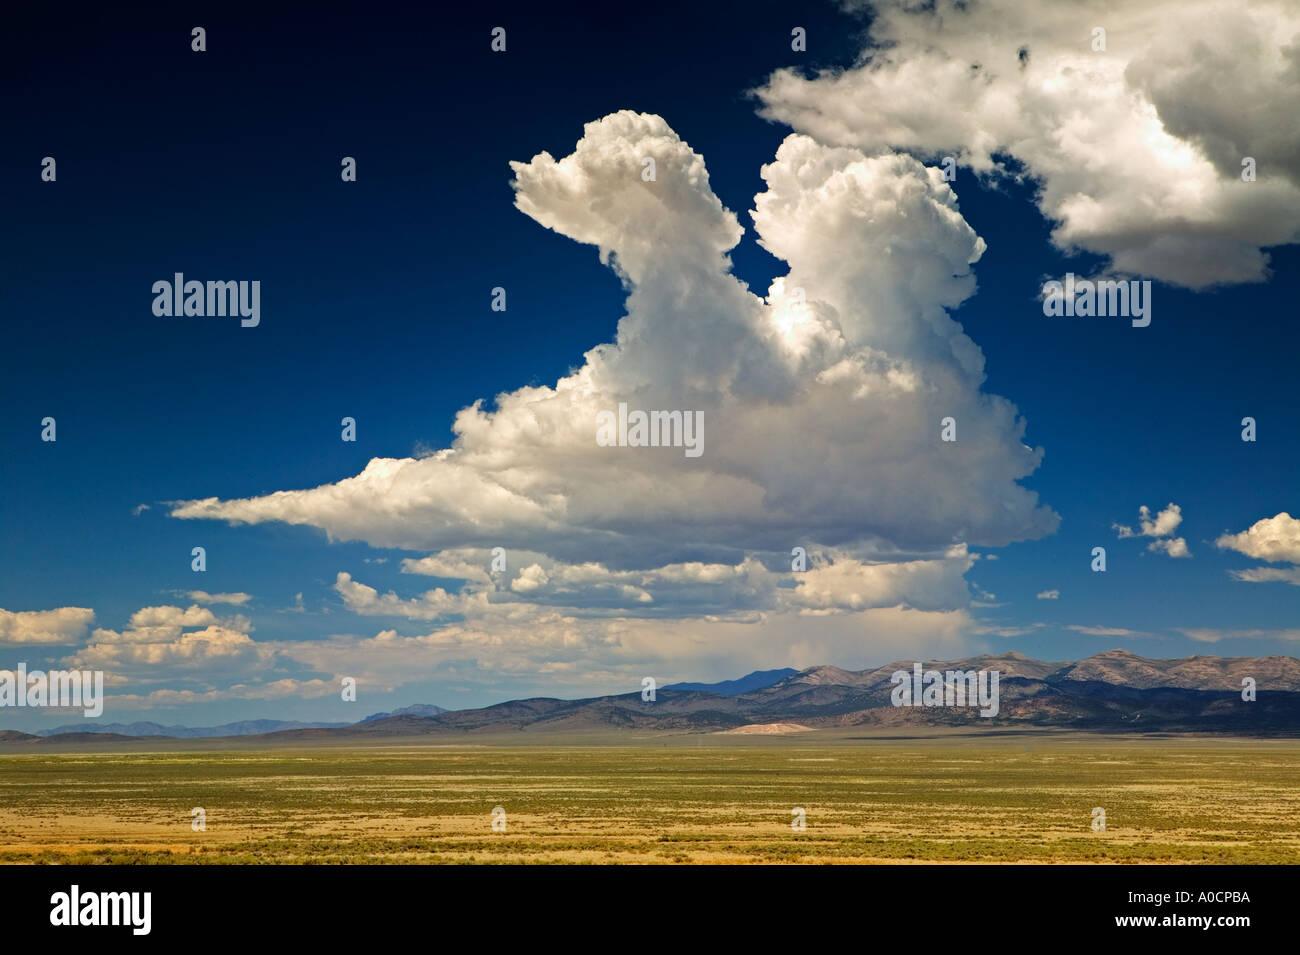 Beginning thunderstorm clouds Near Elko Nevada - Stock Image